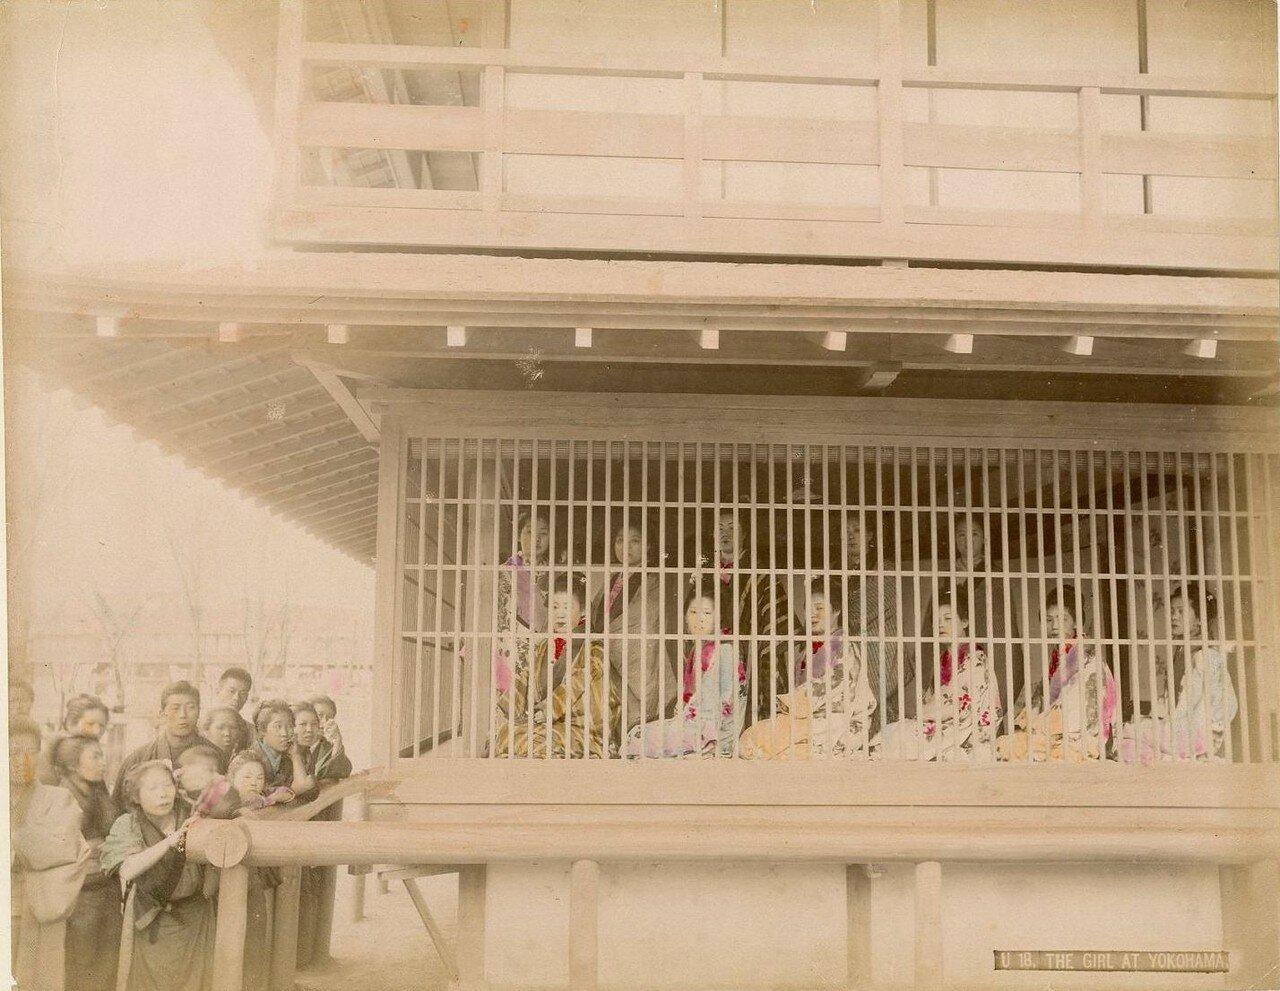 Иокогама. Проститутки